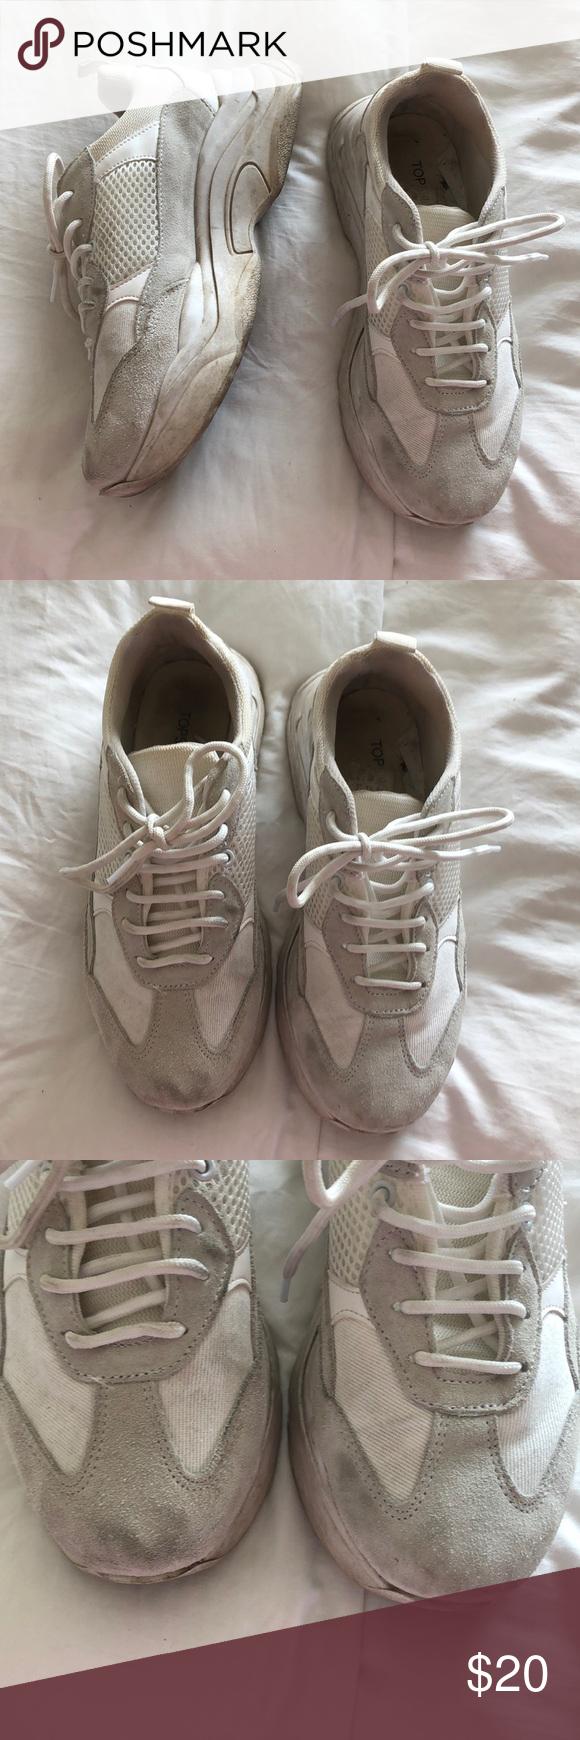 Dad sneakers, Topshop shoes, Topshop